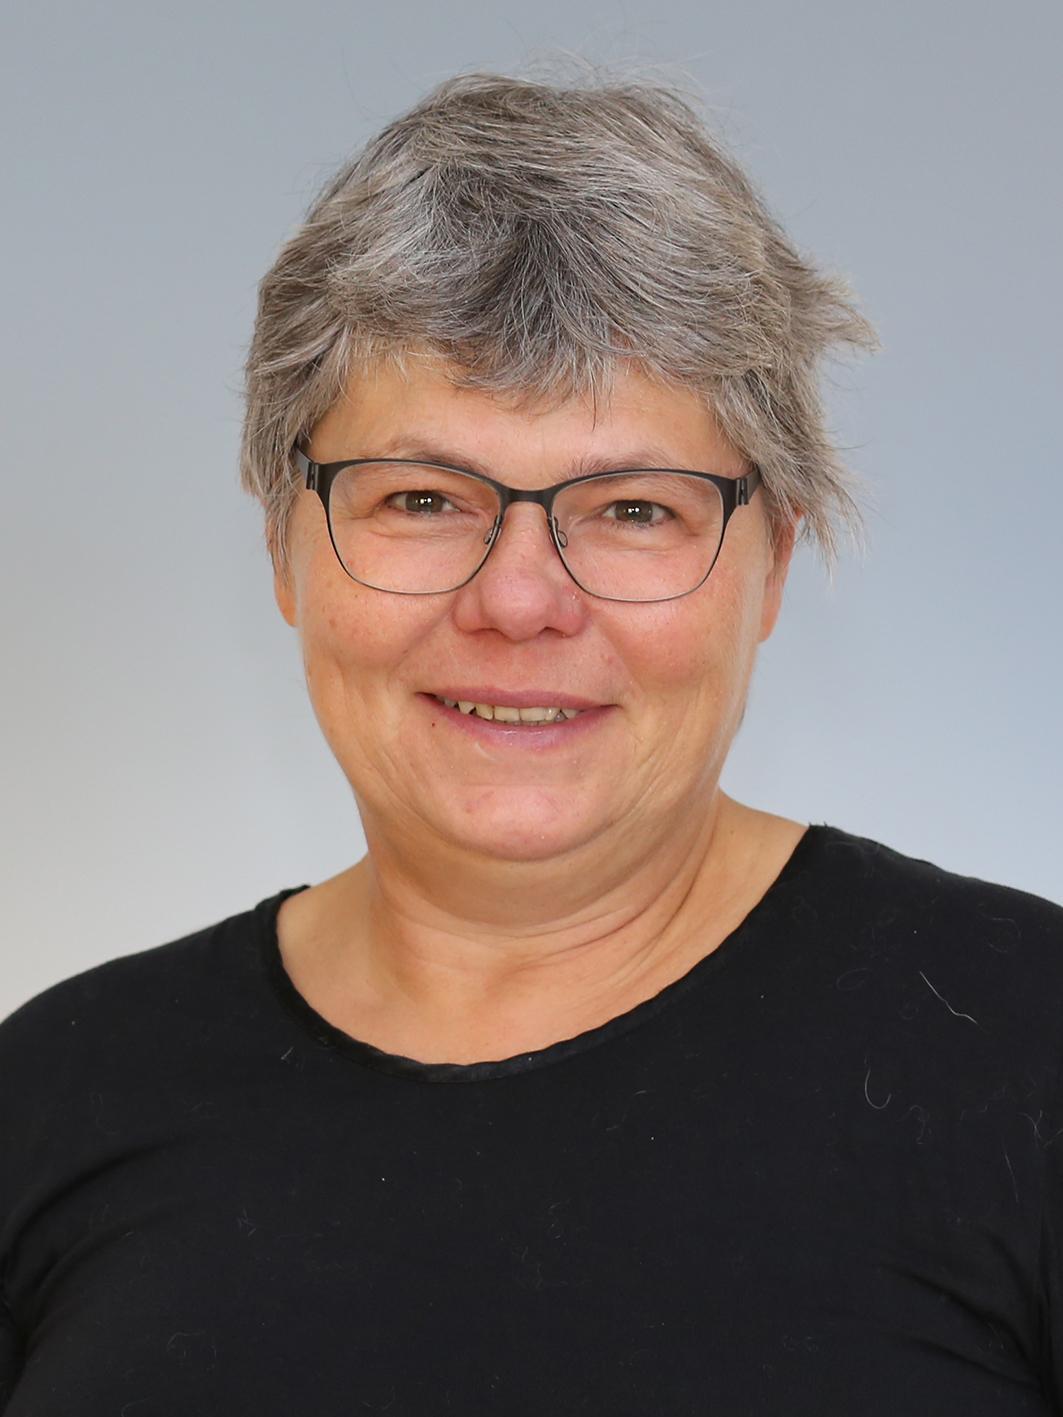 Anette Storgaard